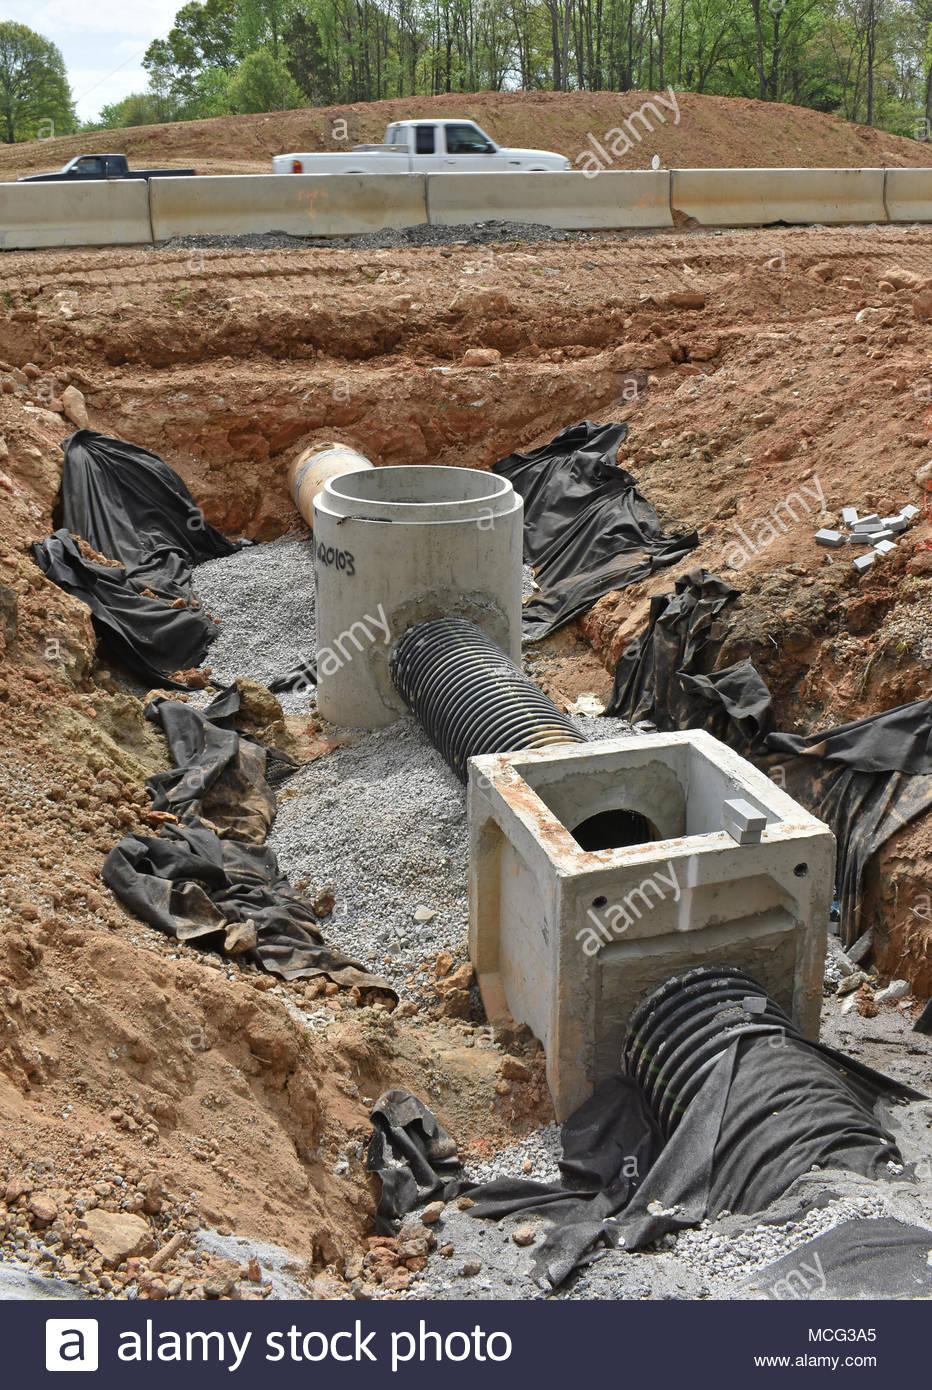 Drainage system under construction Stock Photo: 179833421